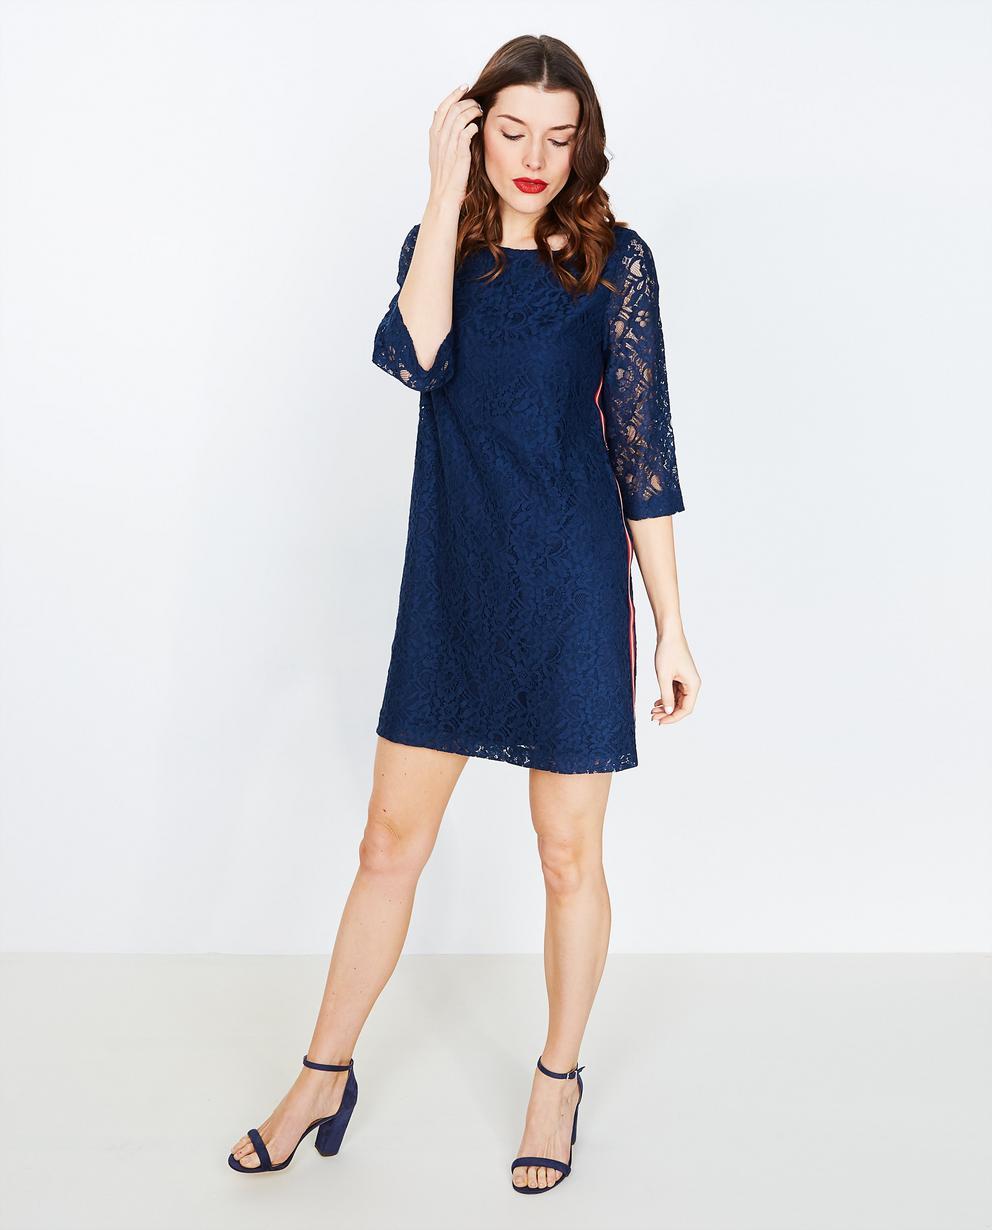 6a3d34892254cf Nachtblauwe jurk - in kant - JBC